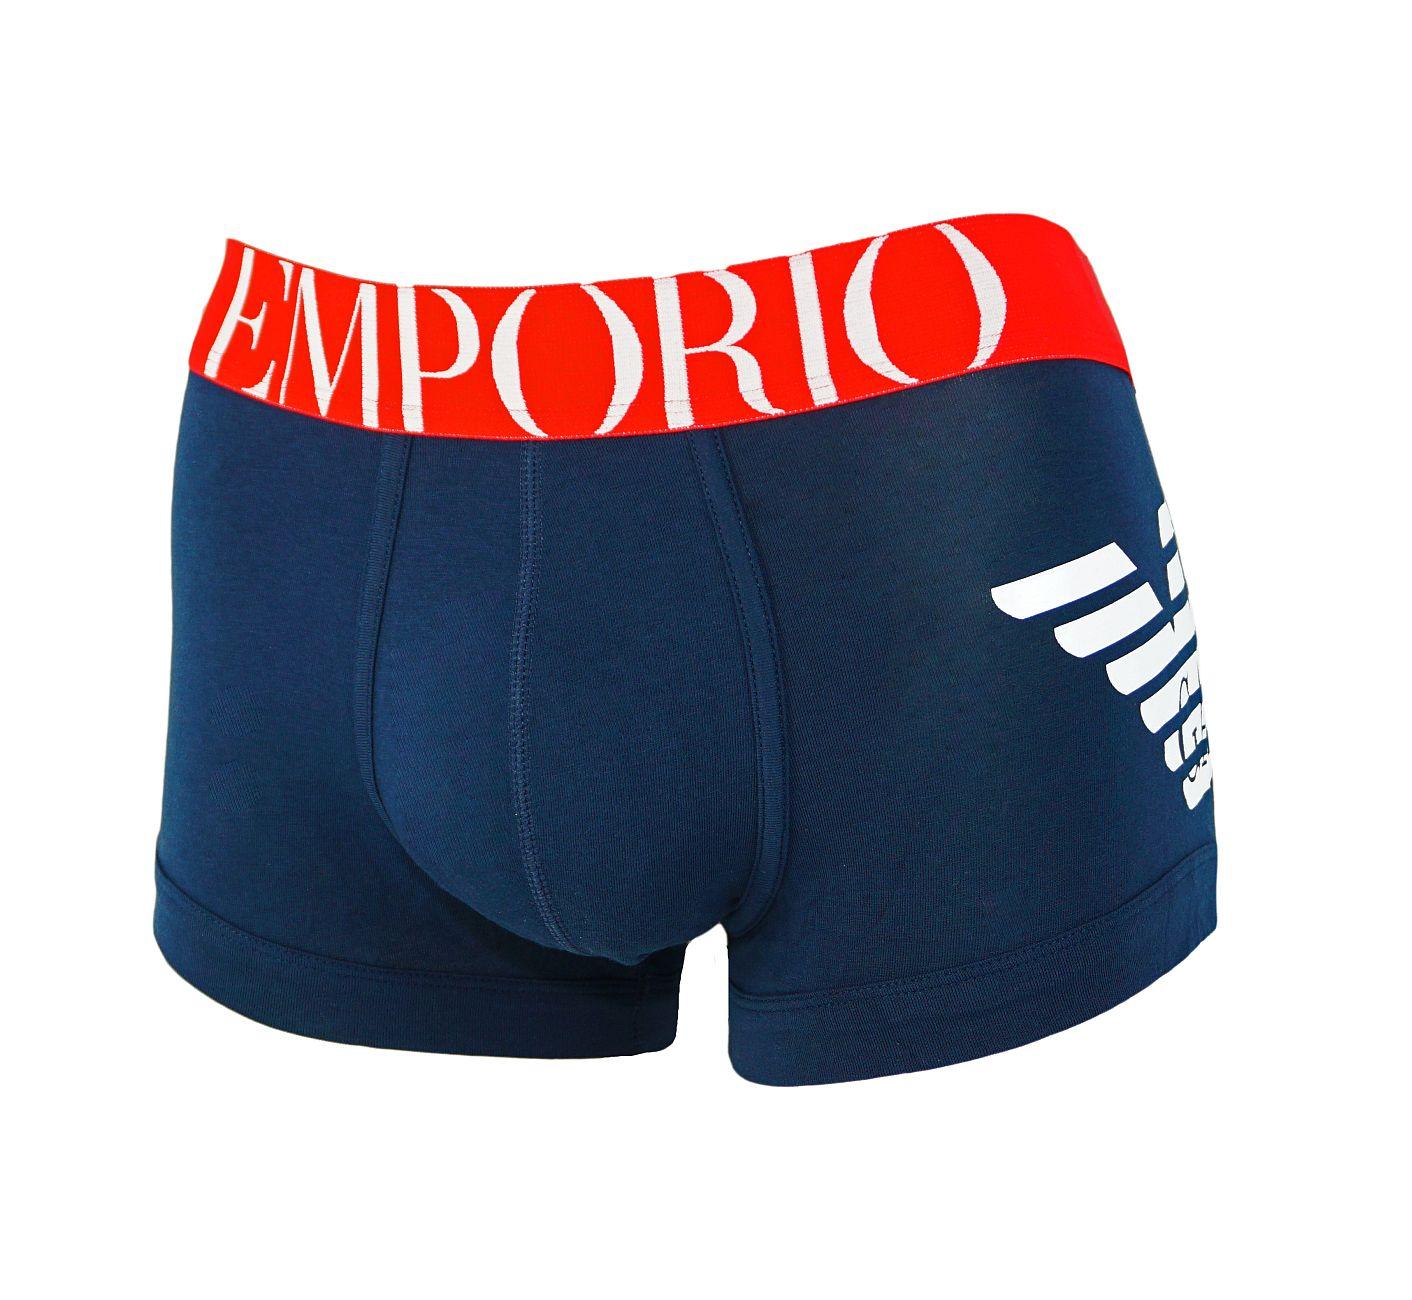 Emporio Armani Trunk Unterhose Short 111866 8P725 00135 MARINE F18-EAT2